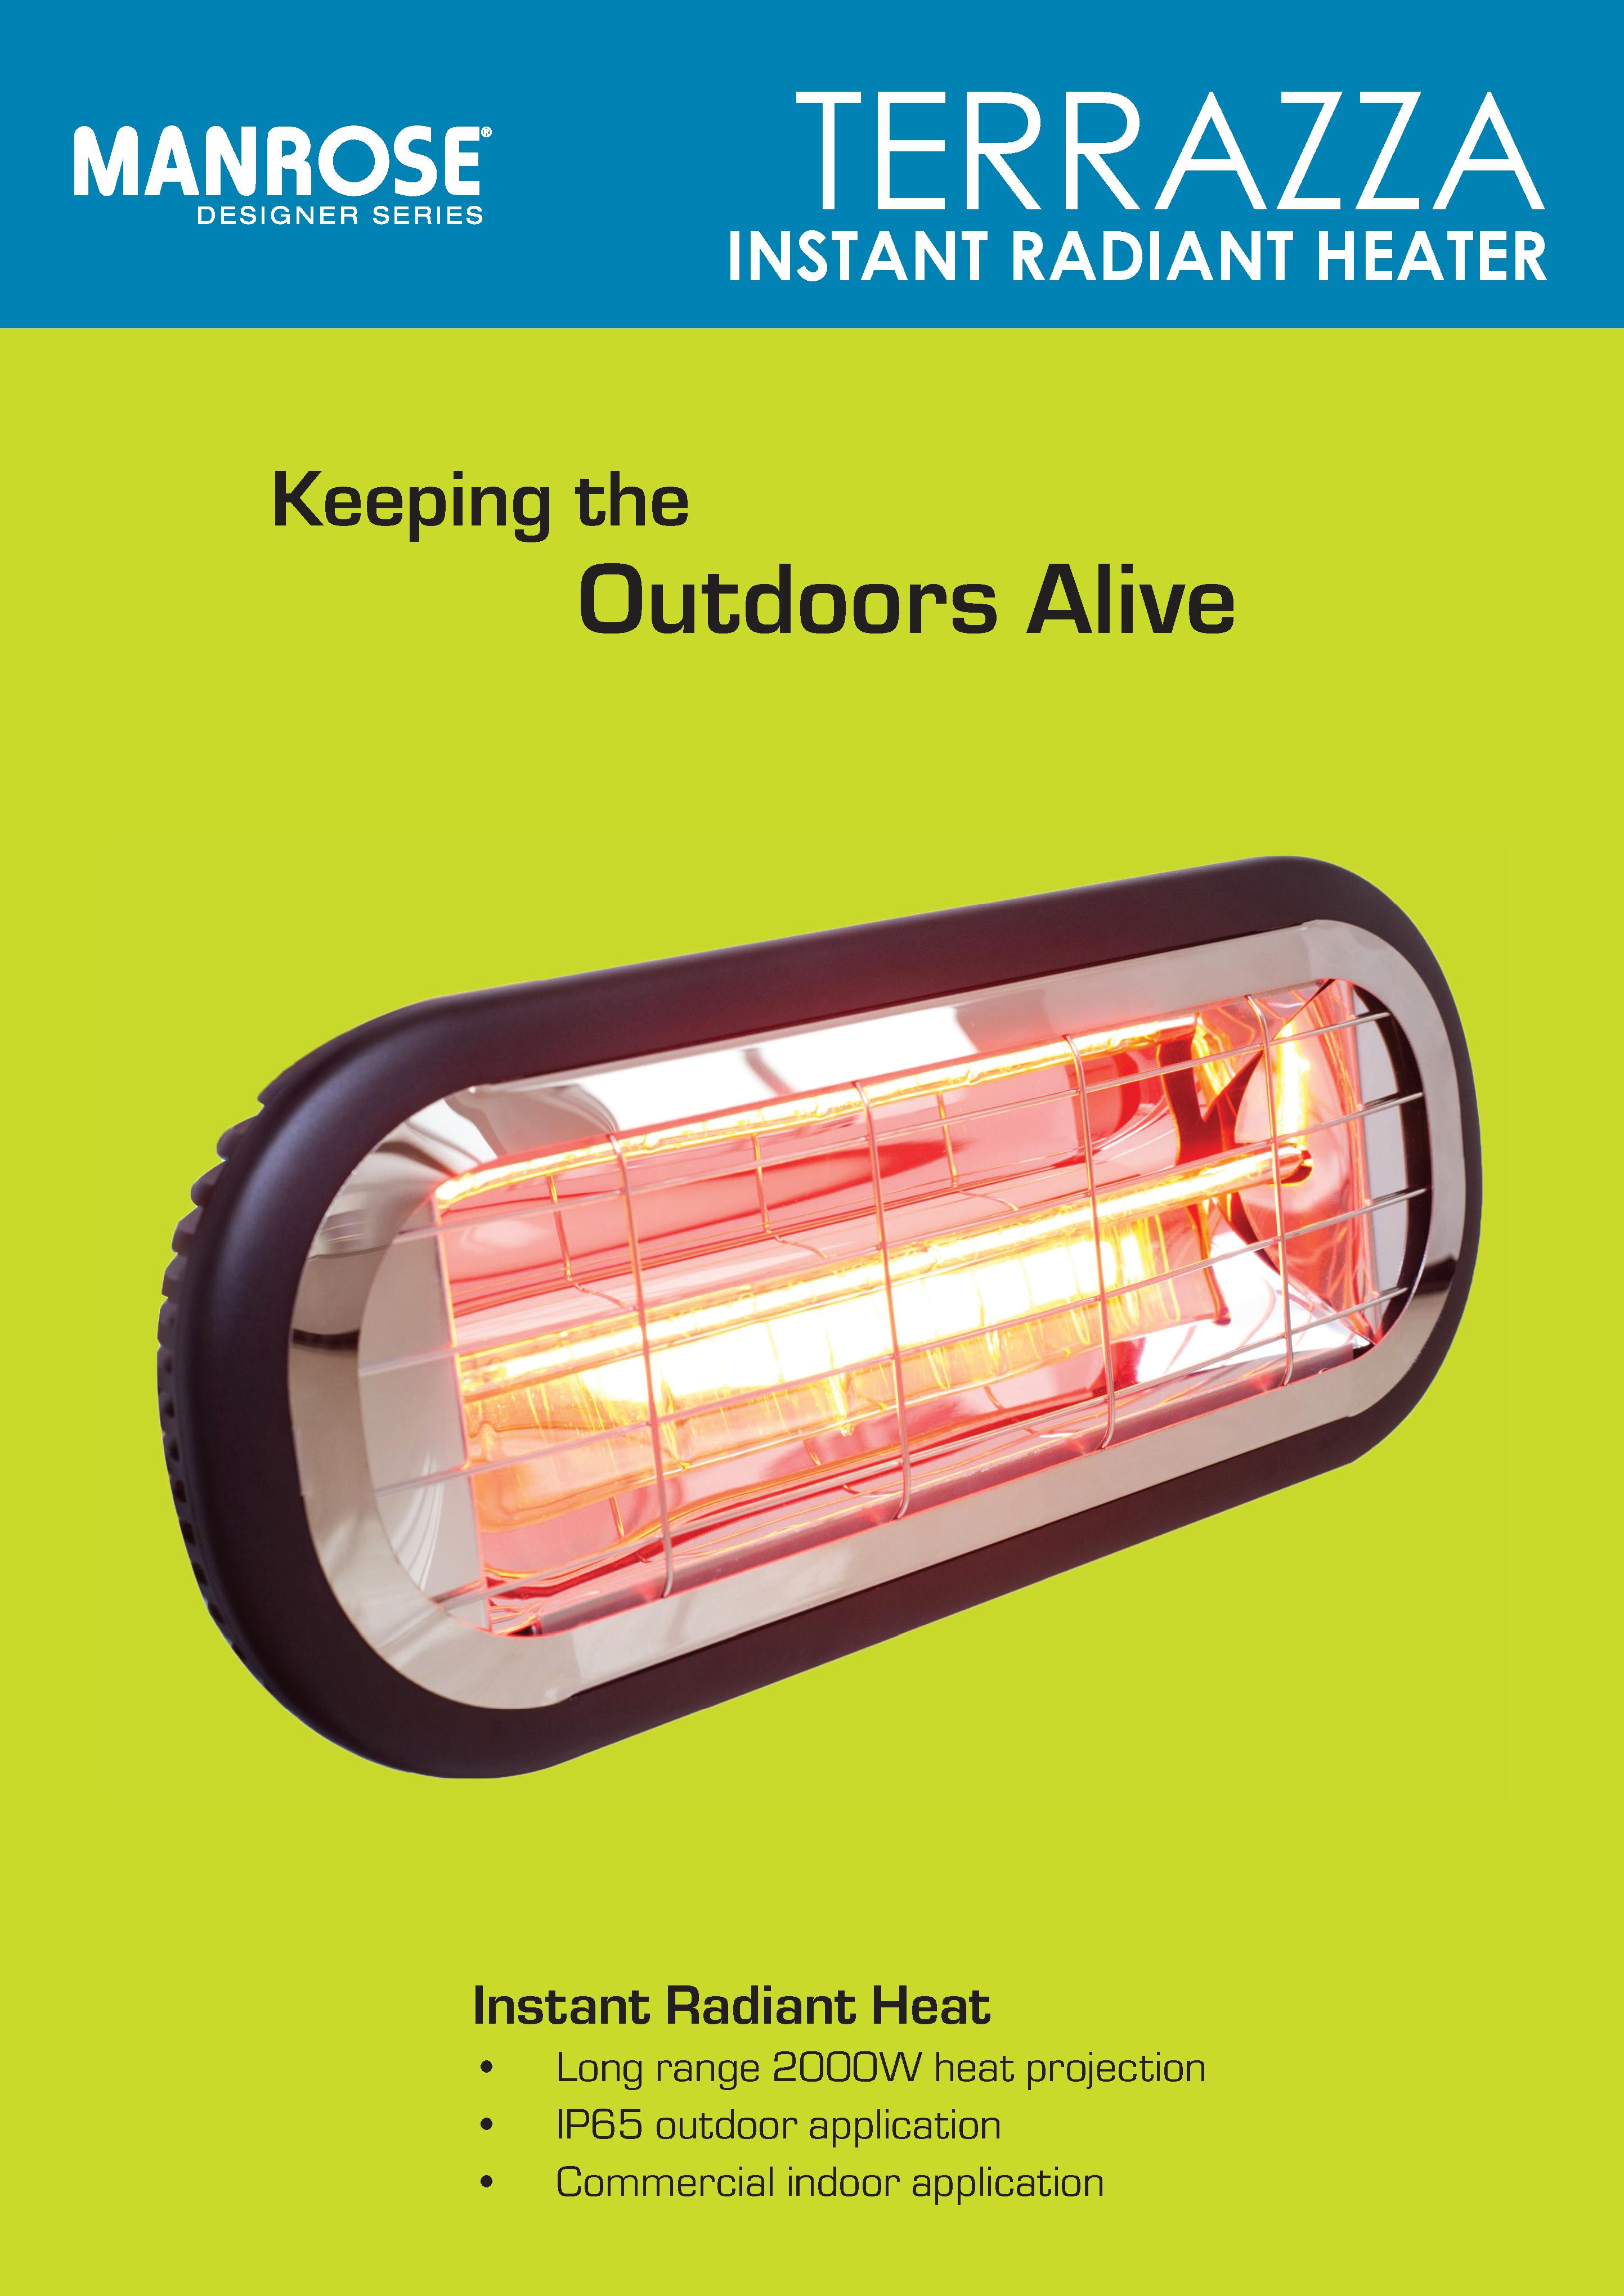 Terrazza Instant Radiant Heater Brochure